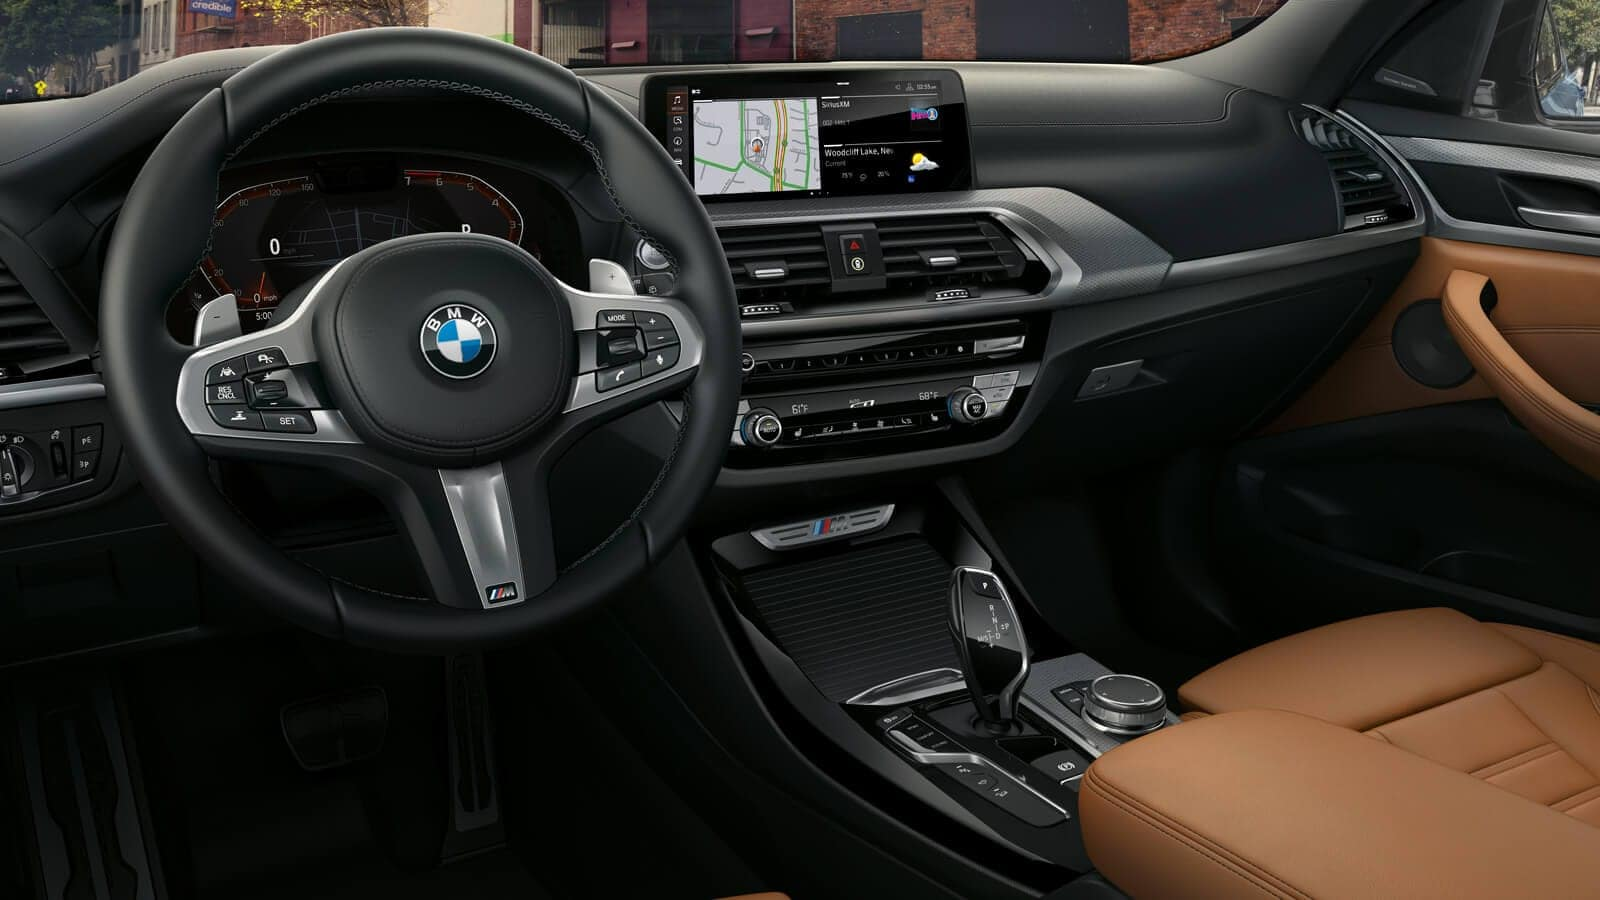 BMW X3 Guam